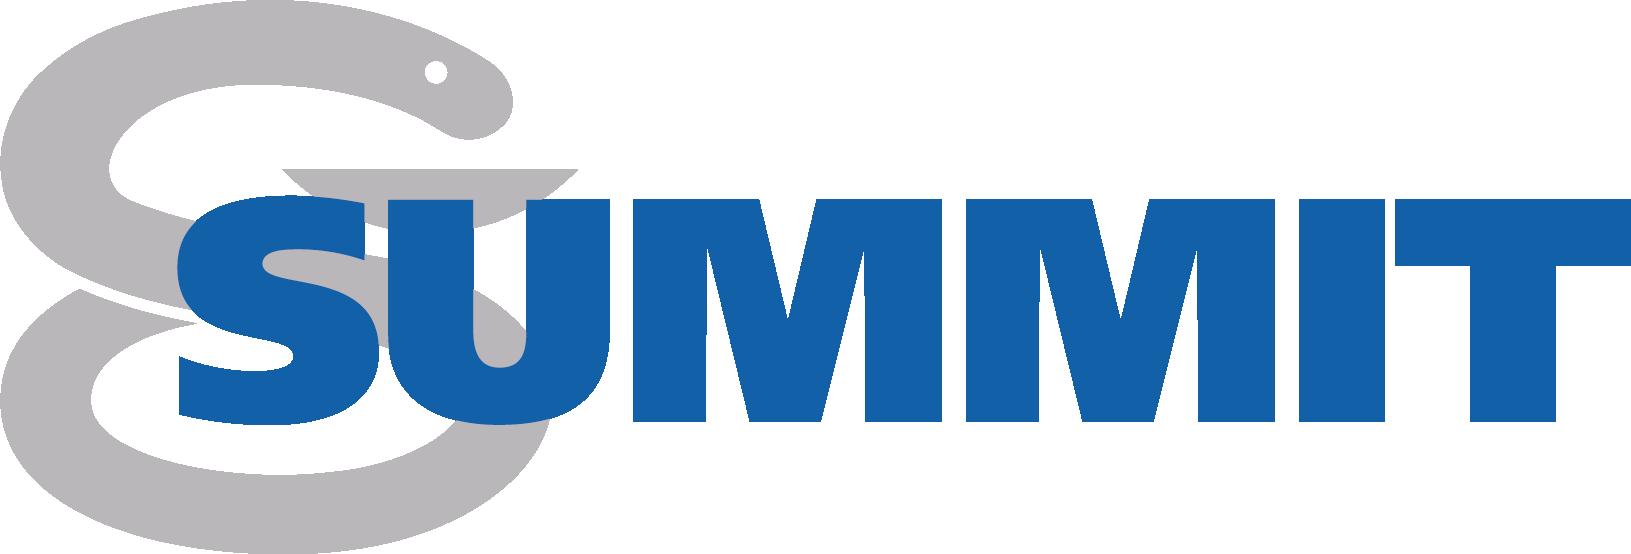 Summit Veterinary Pharmaceuticals Ltd.